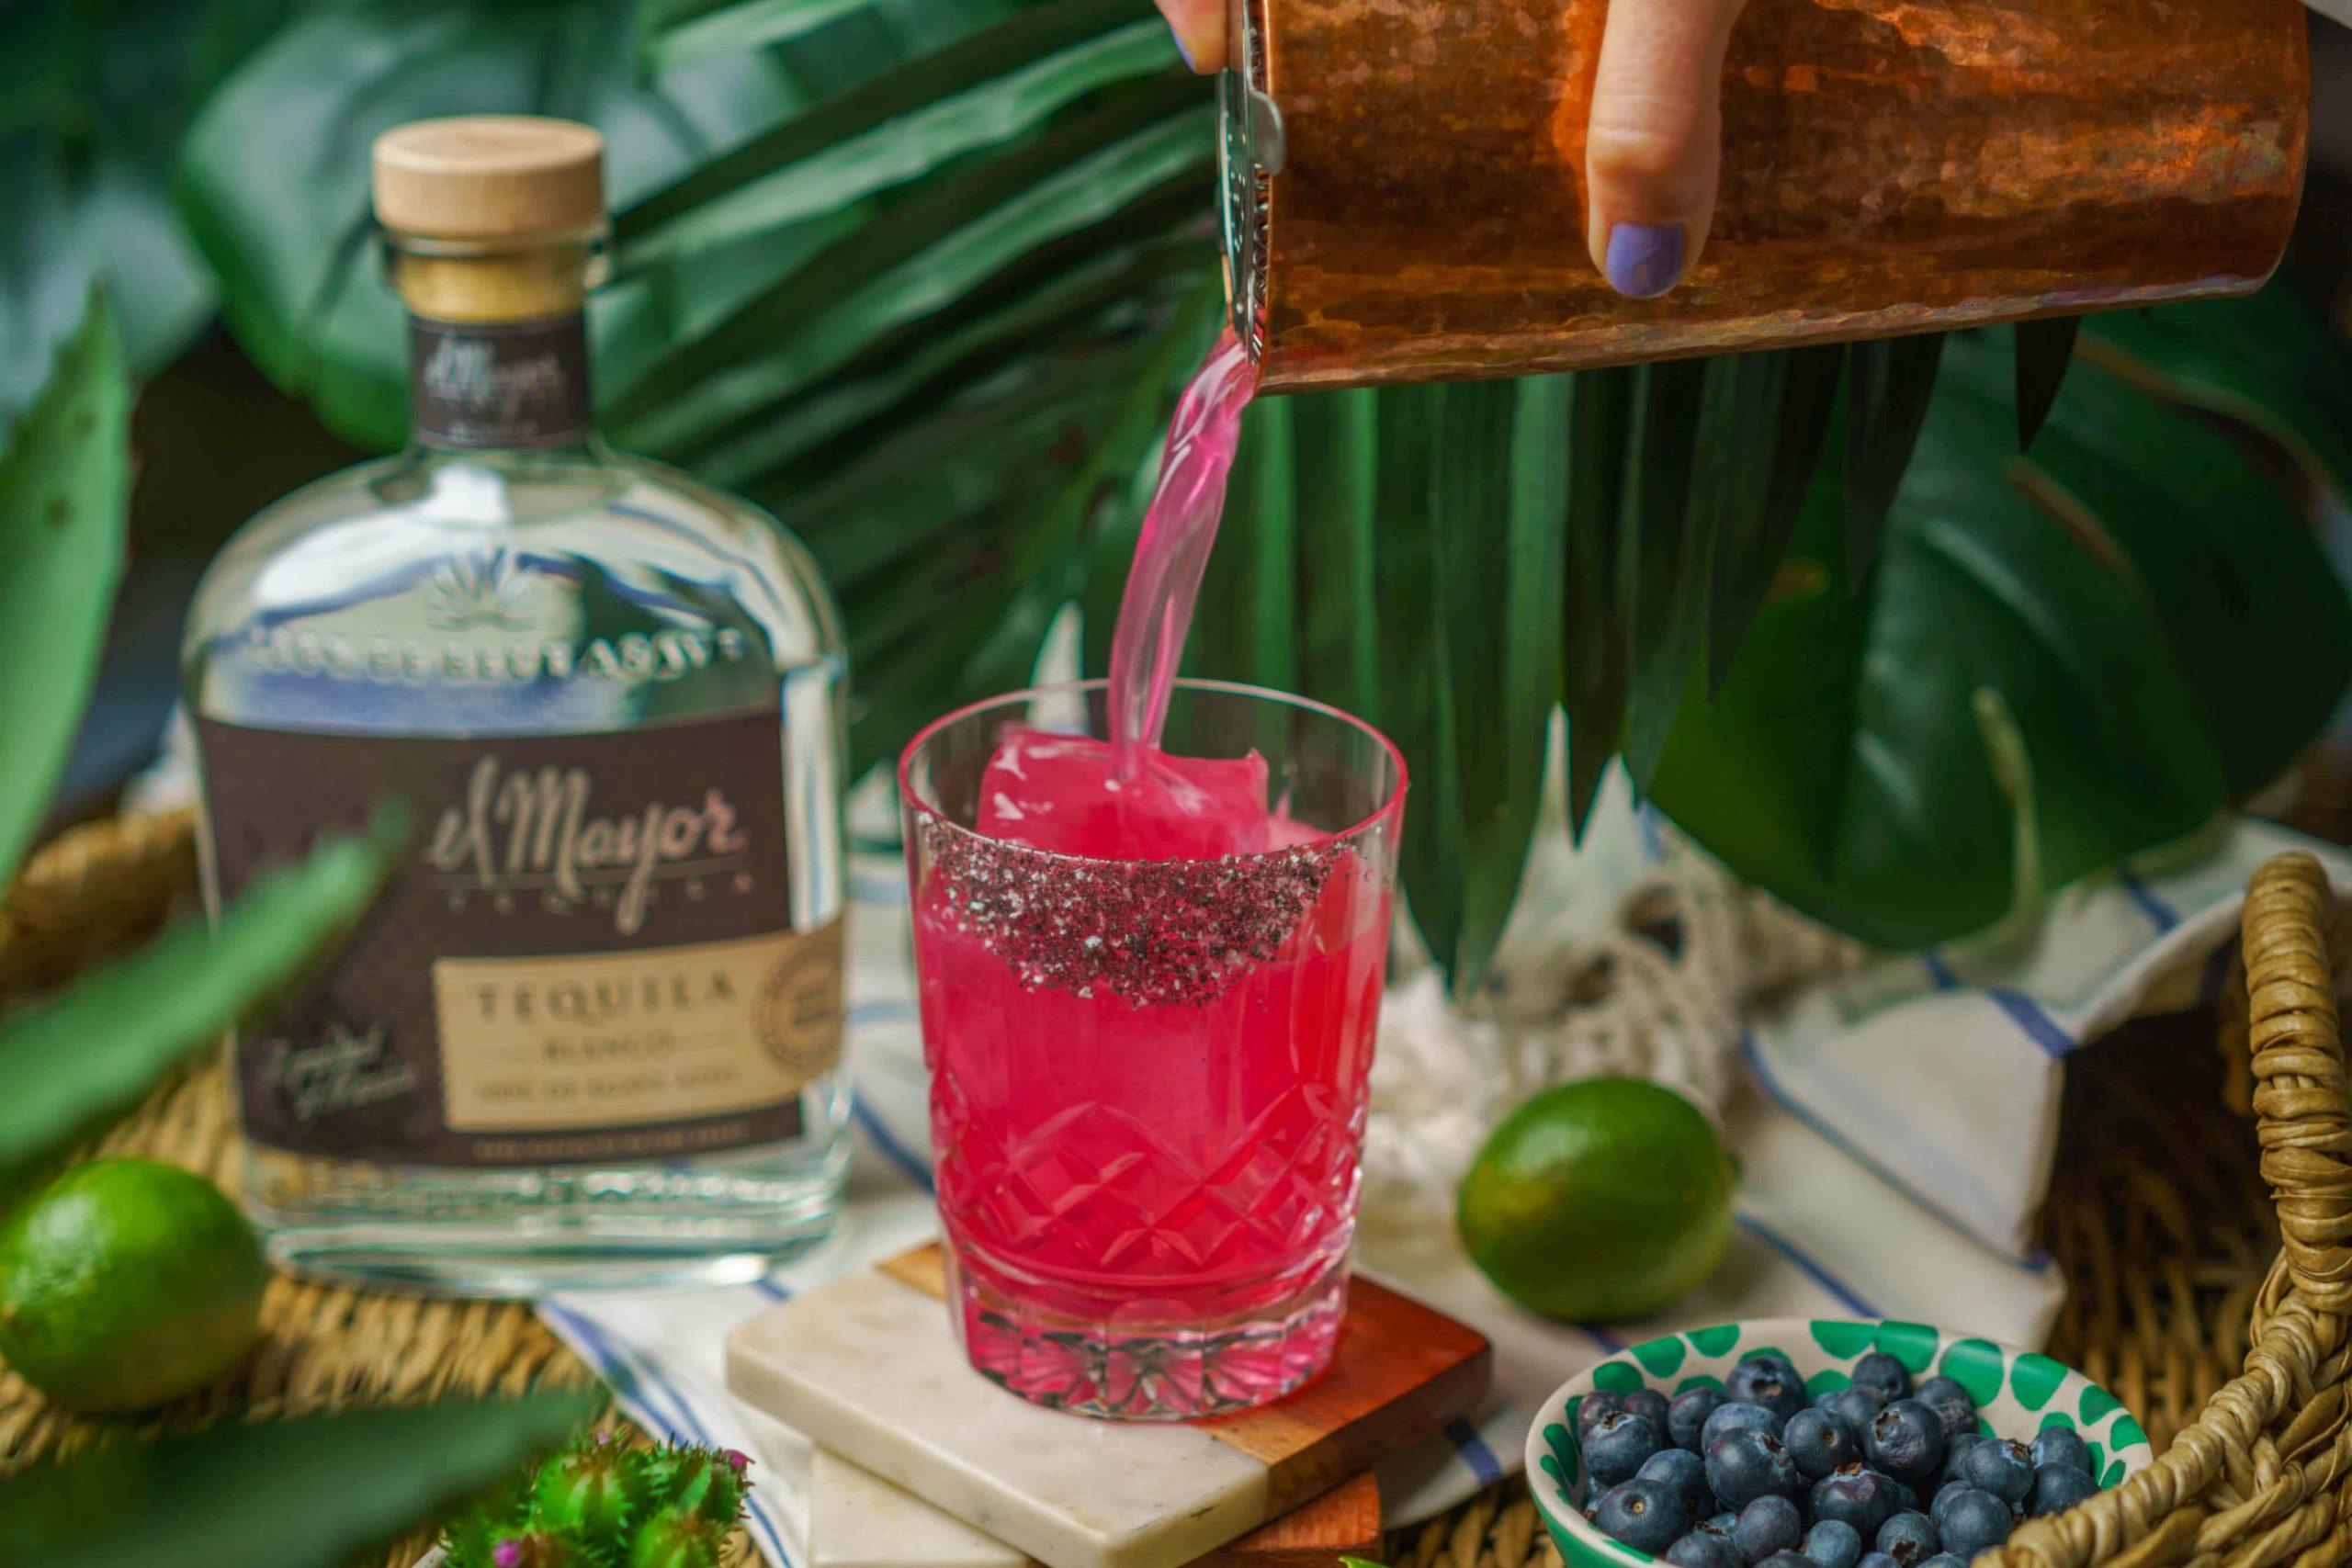 , Blueberry Margarita with El Mayor Tequila